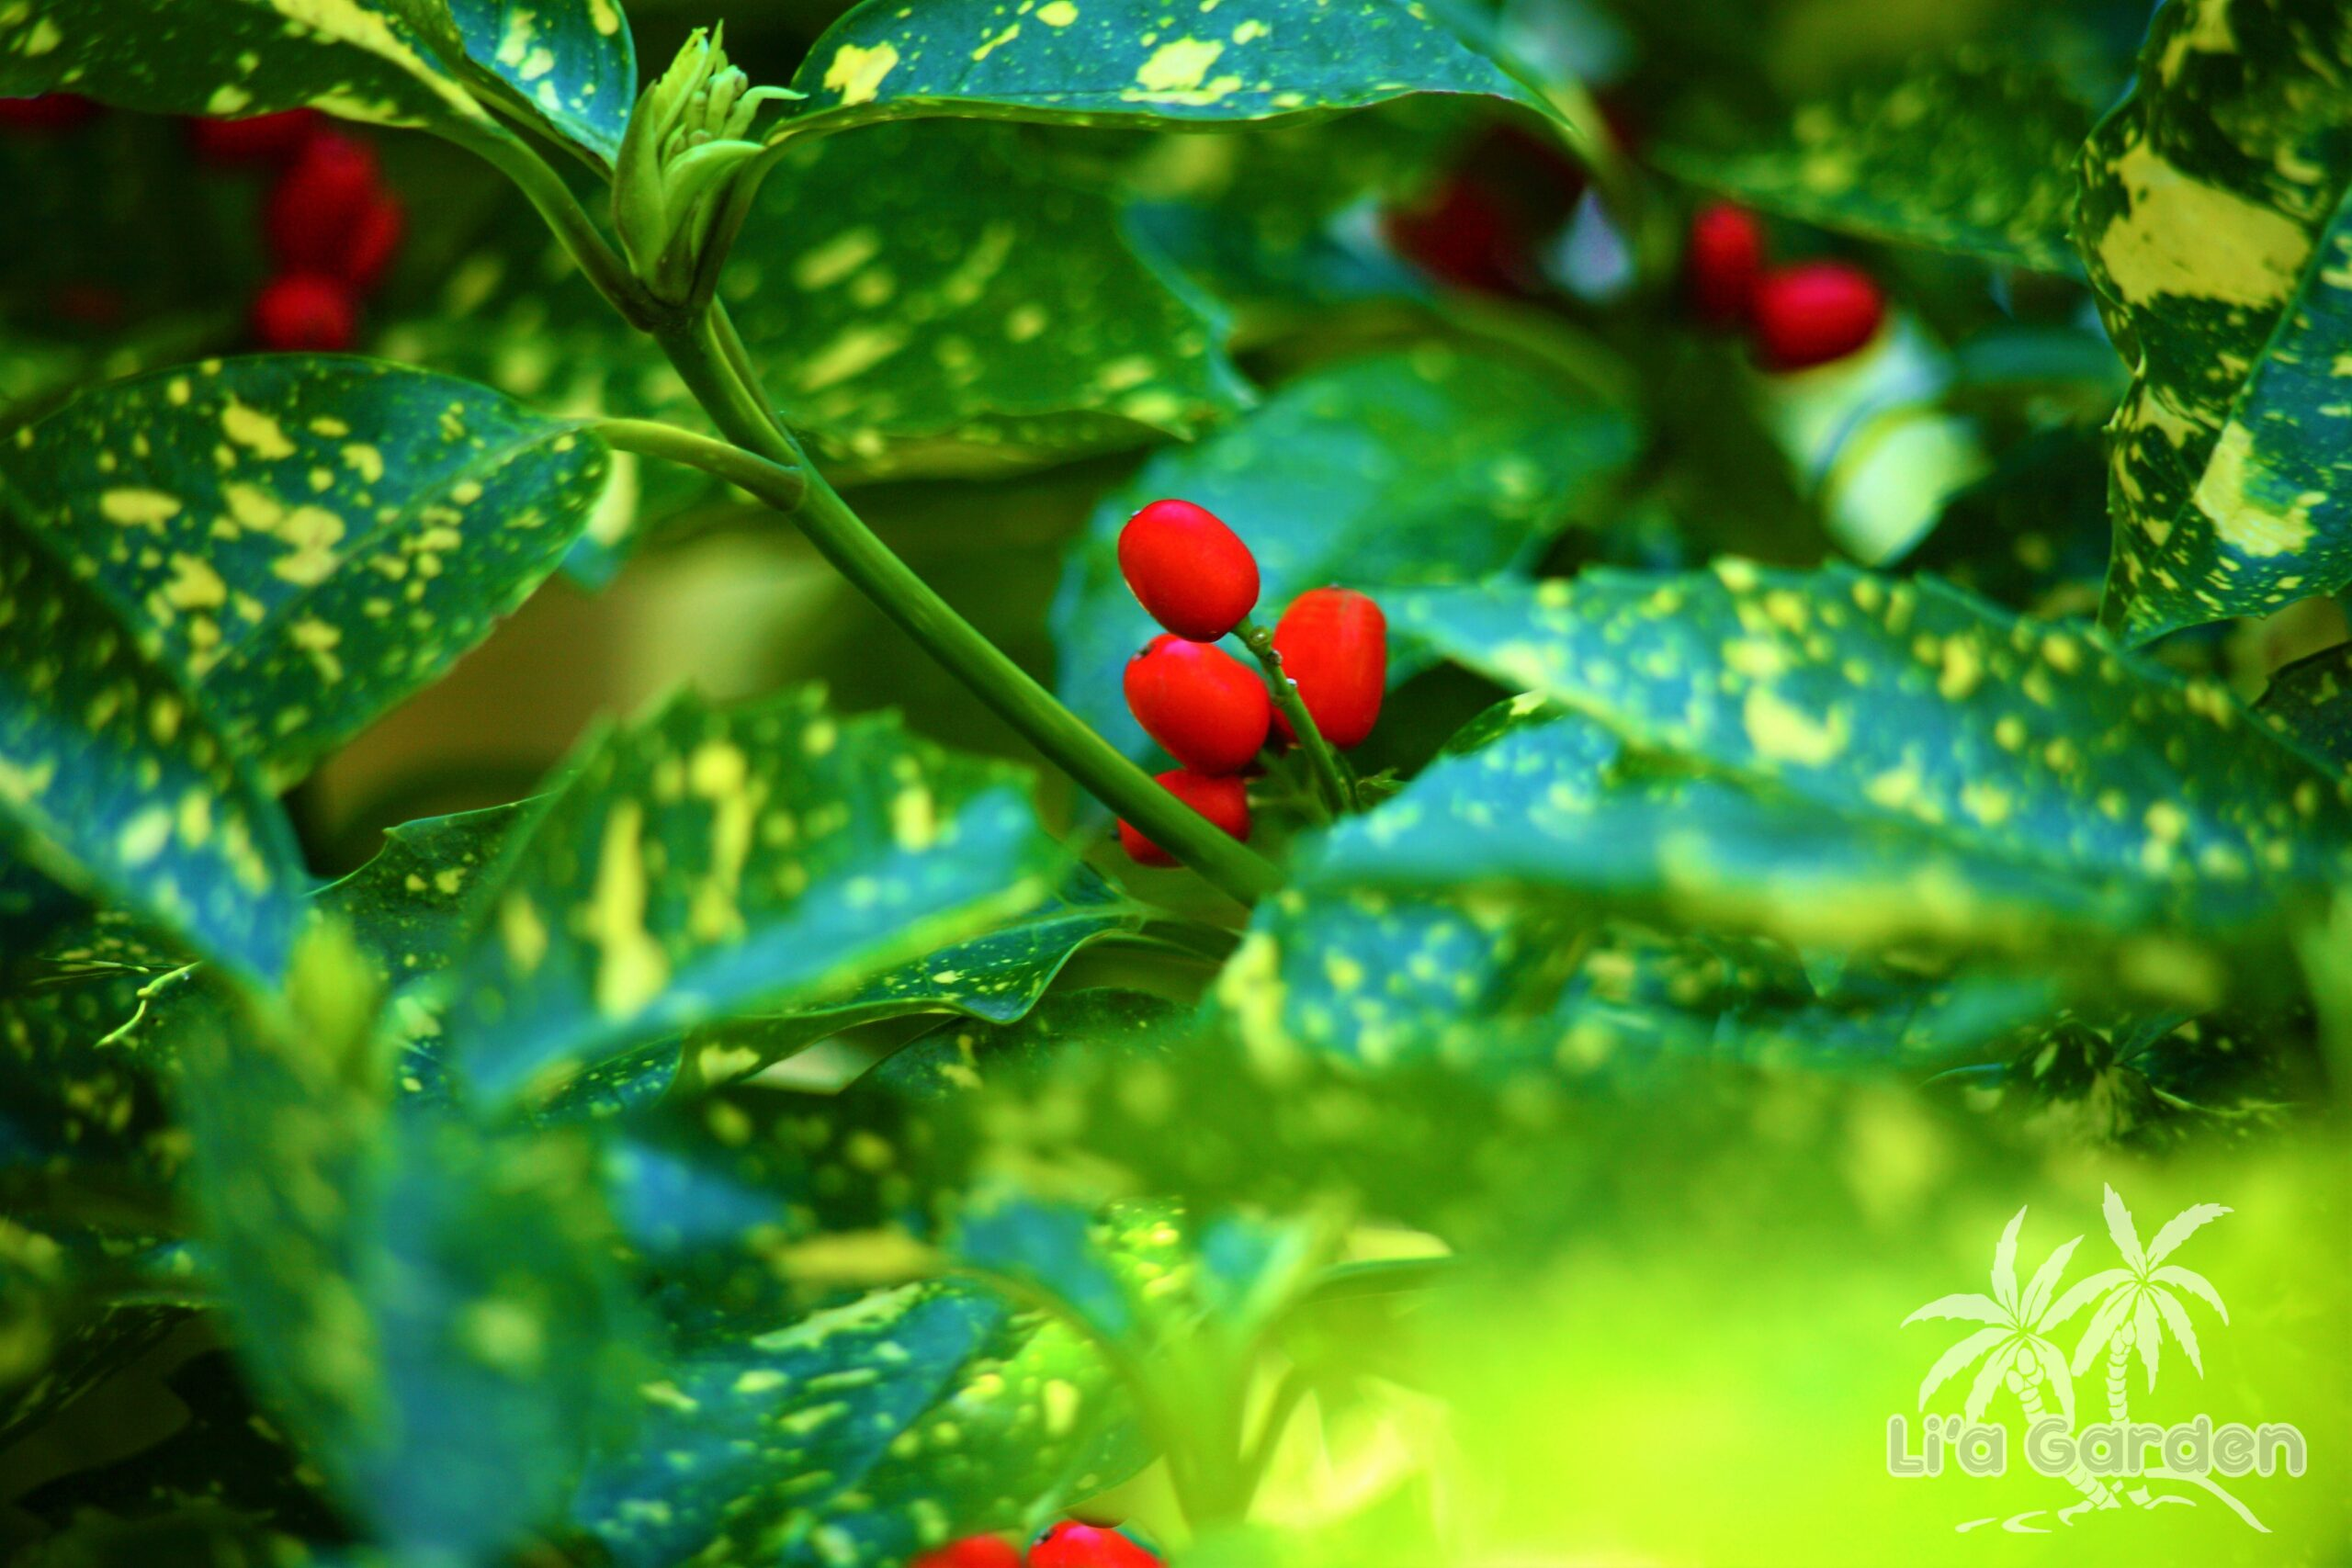 【低木】 アオキ Aucuba japonica 〈常緑広葉樹〉